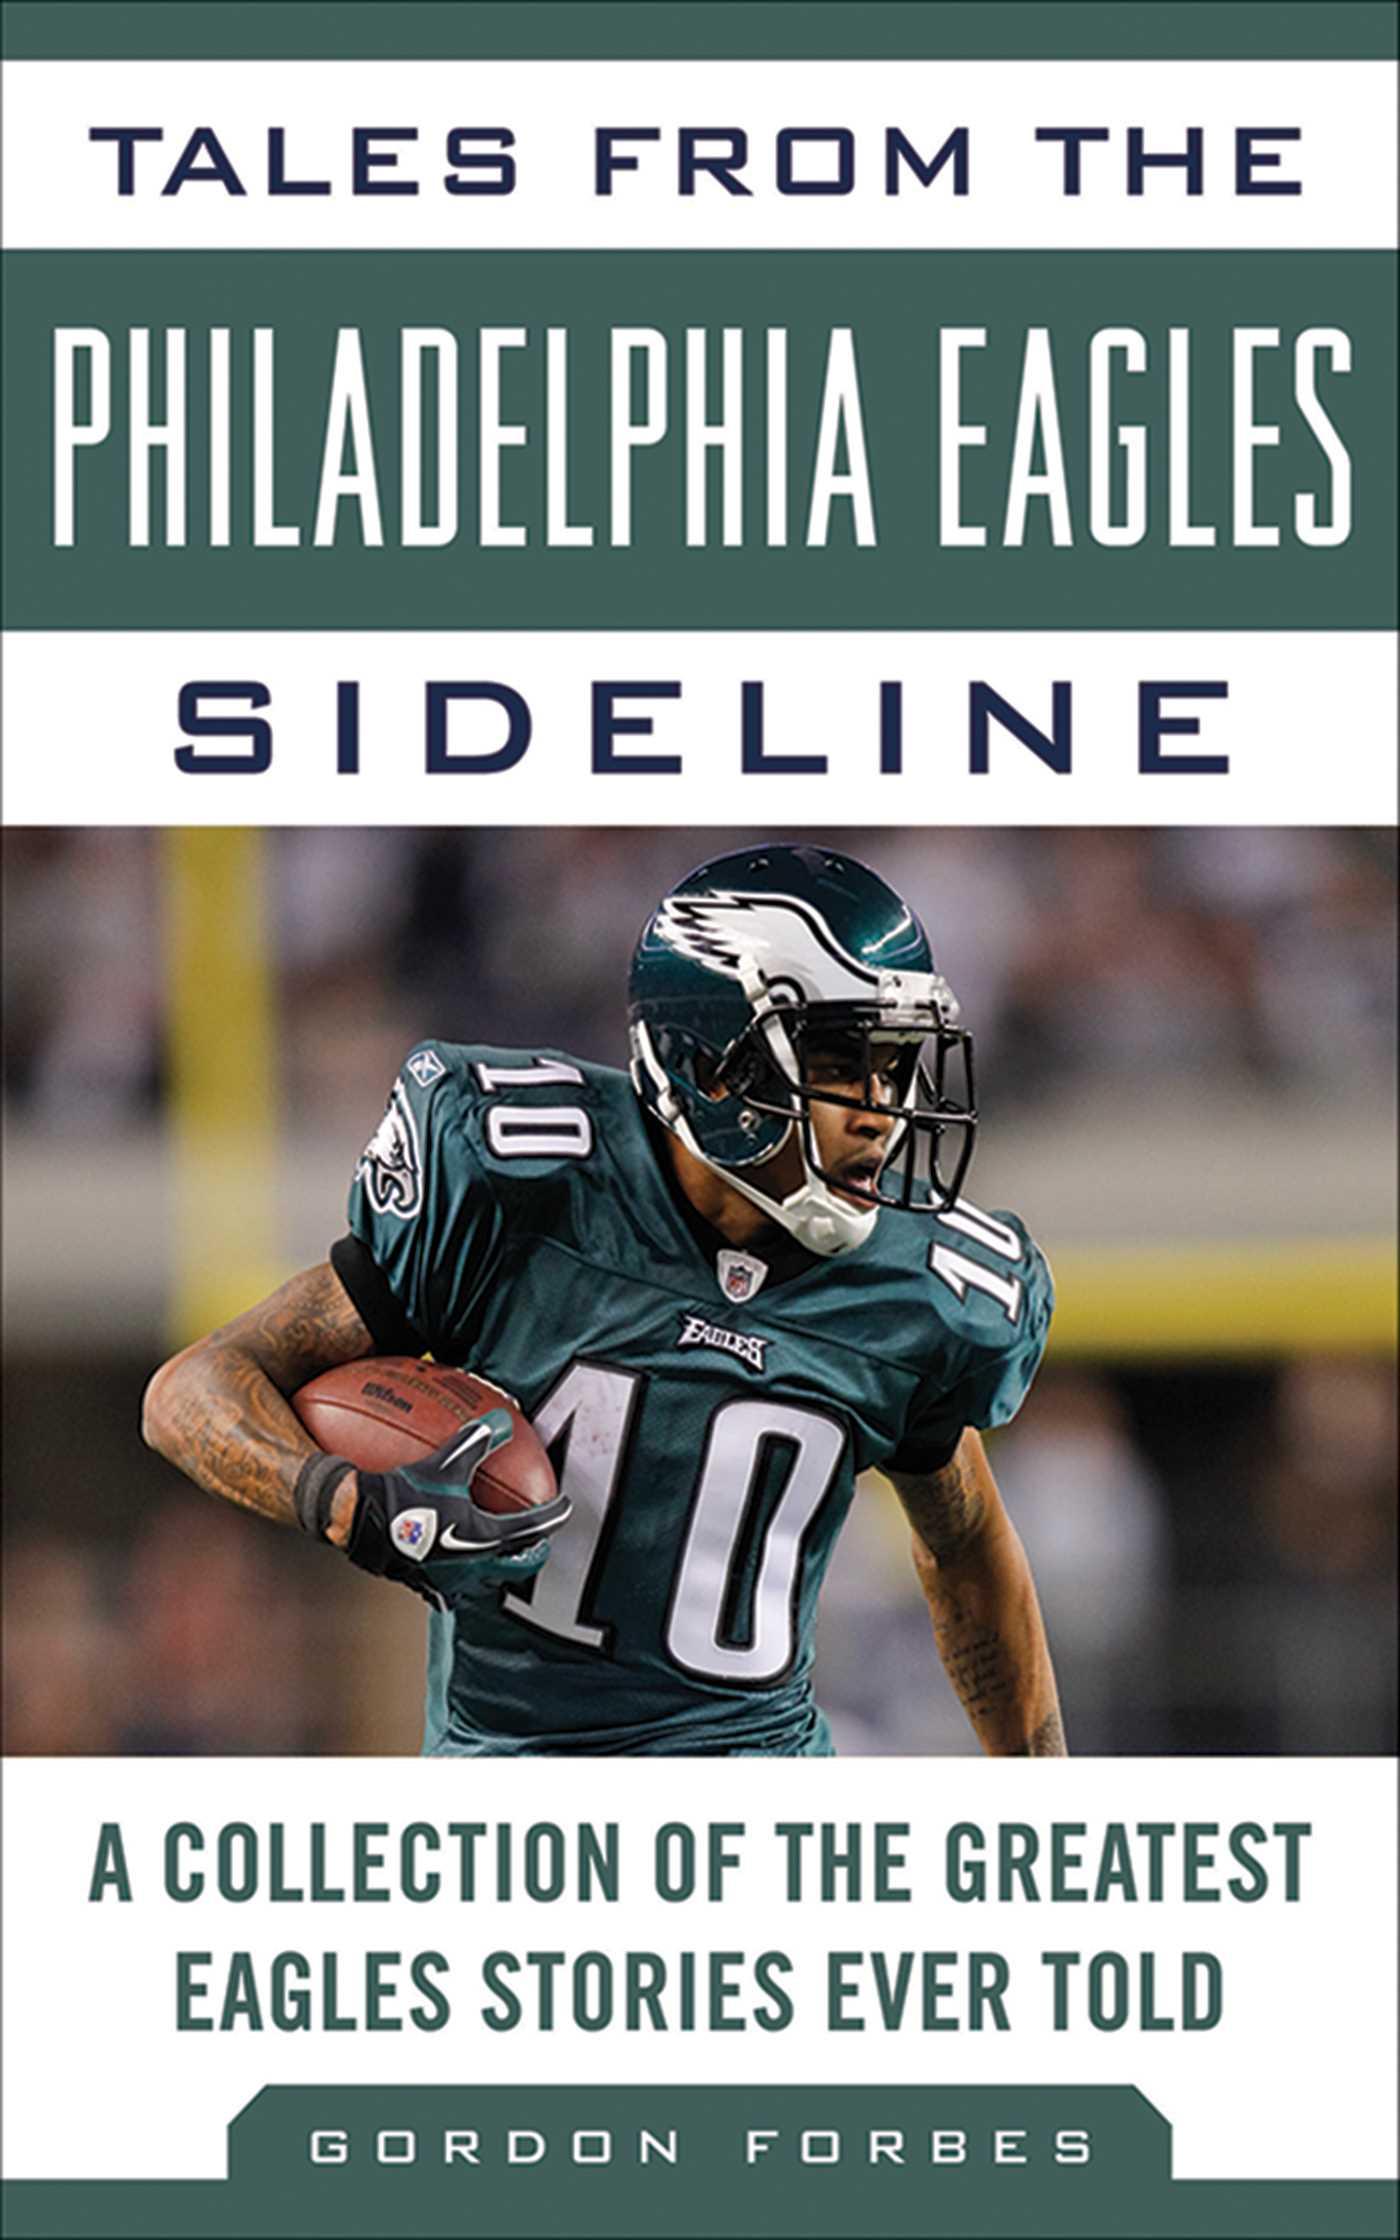 super popular 6e9f7 6c4bb Tales from the Philadelphia Eagles Sideline eBook by Gordon ...